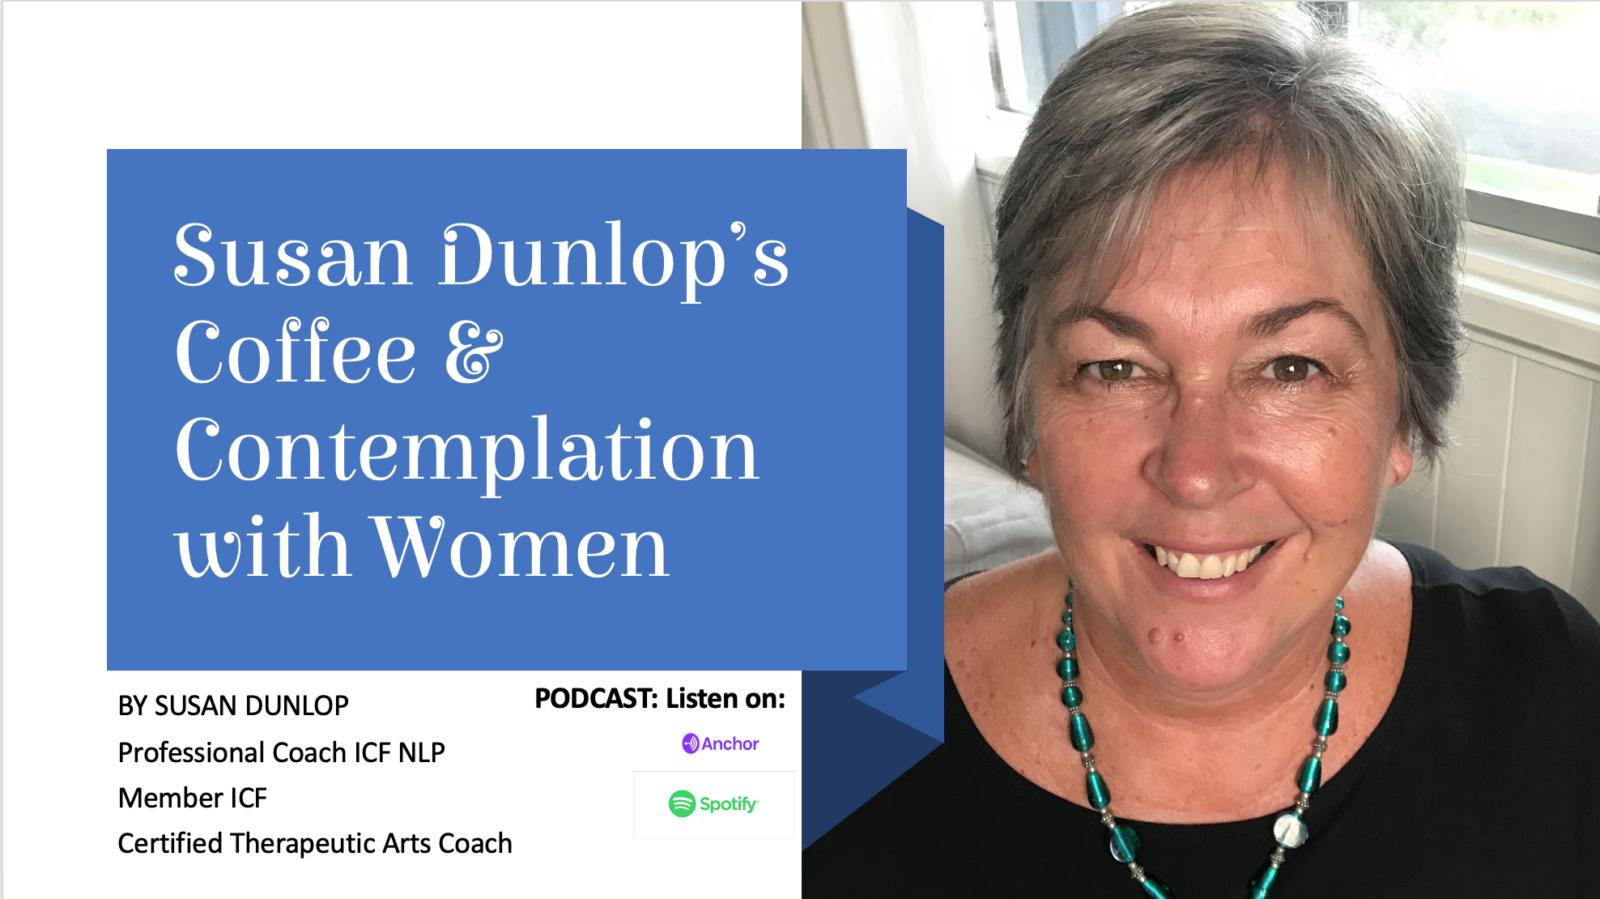 Susan Dunlop Podcast now live on Spotify